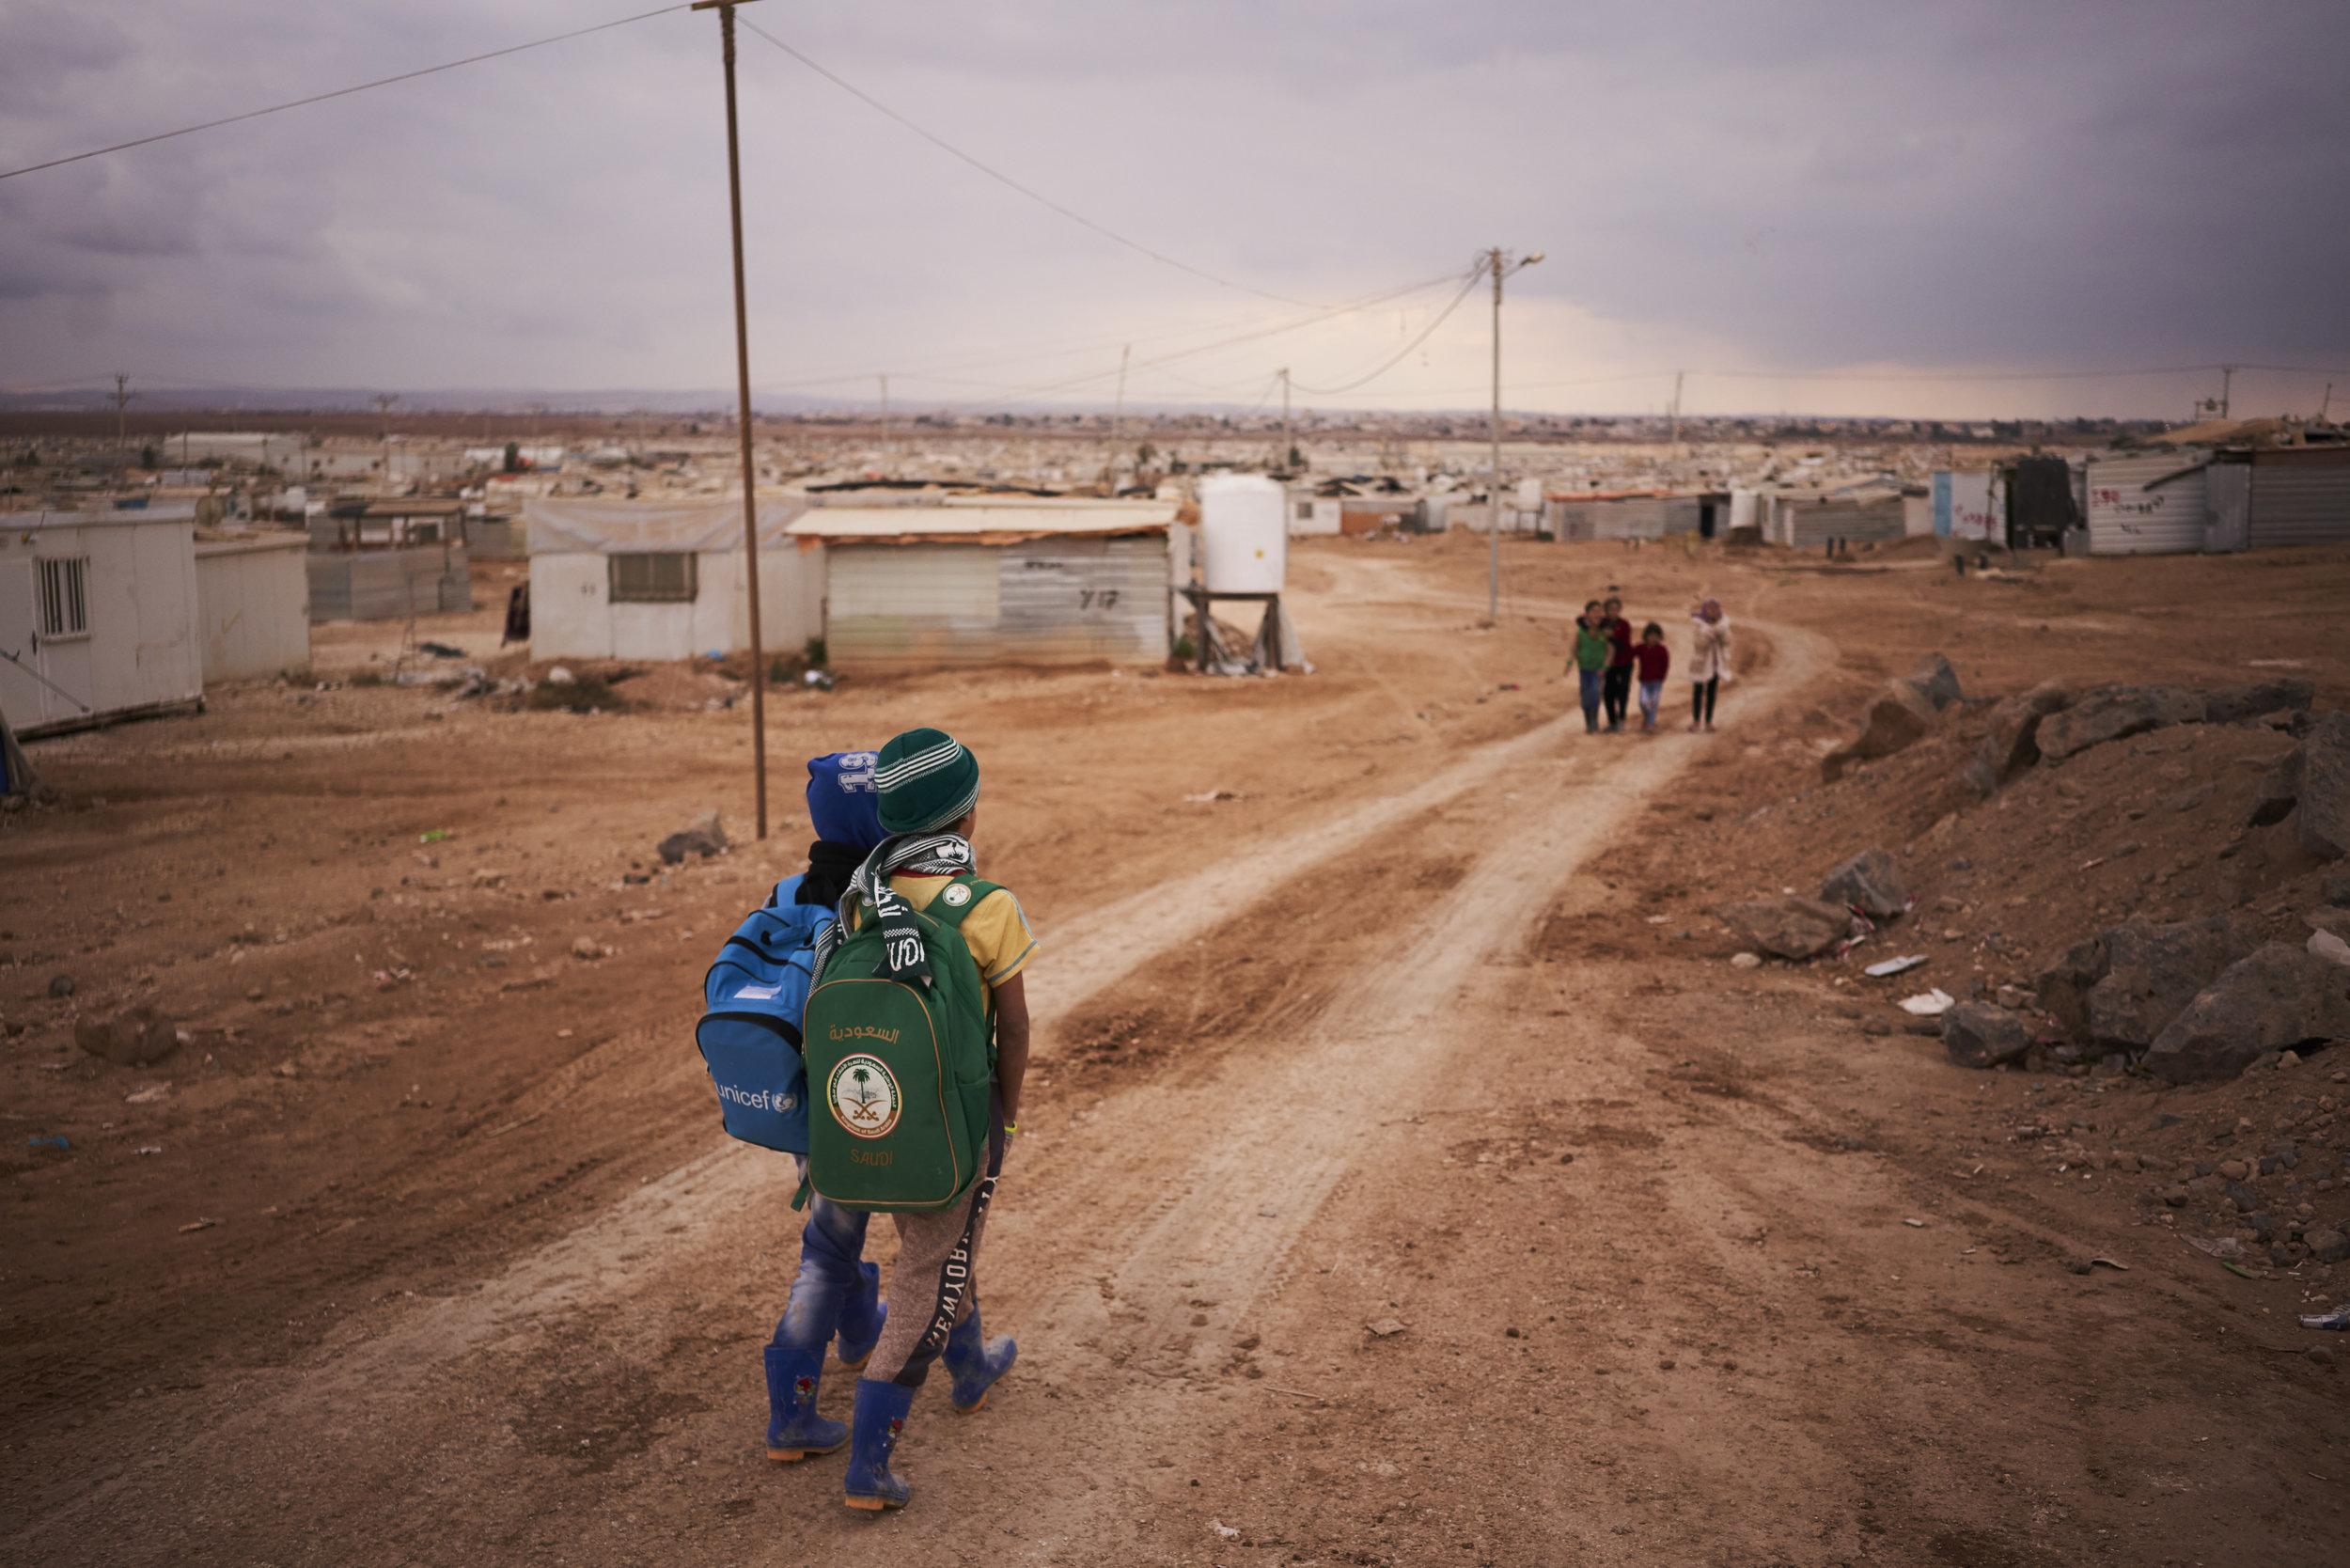 Syrian refugee children make their way home from school in Zaatari refugee camp, Mafraq Governorate, Jordan.